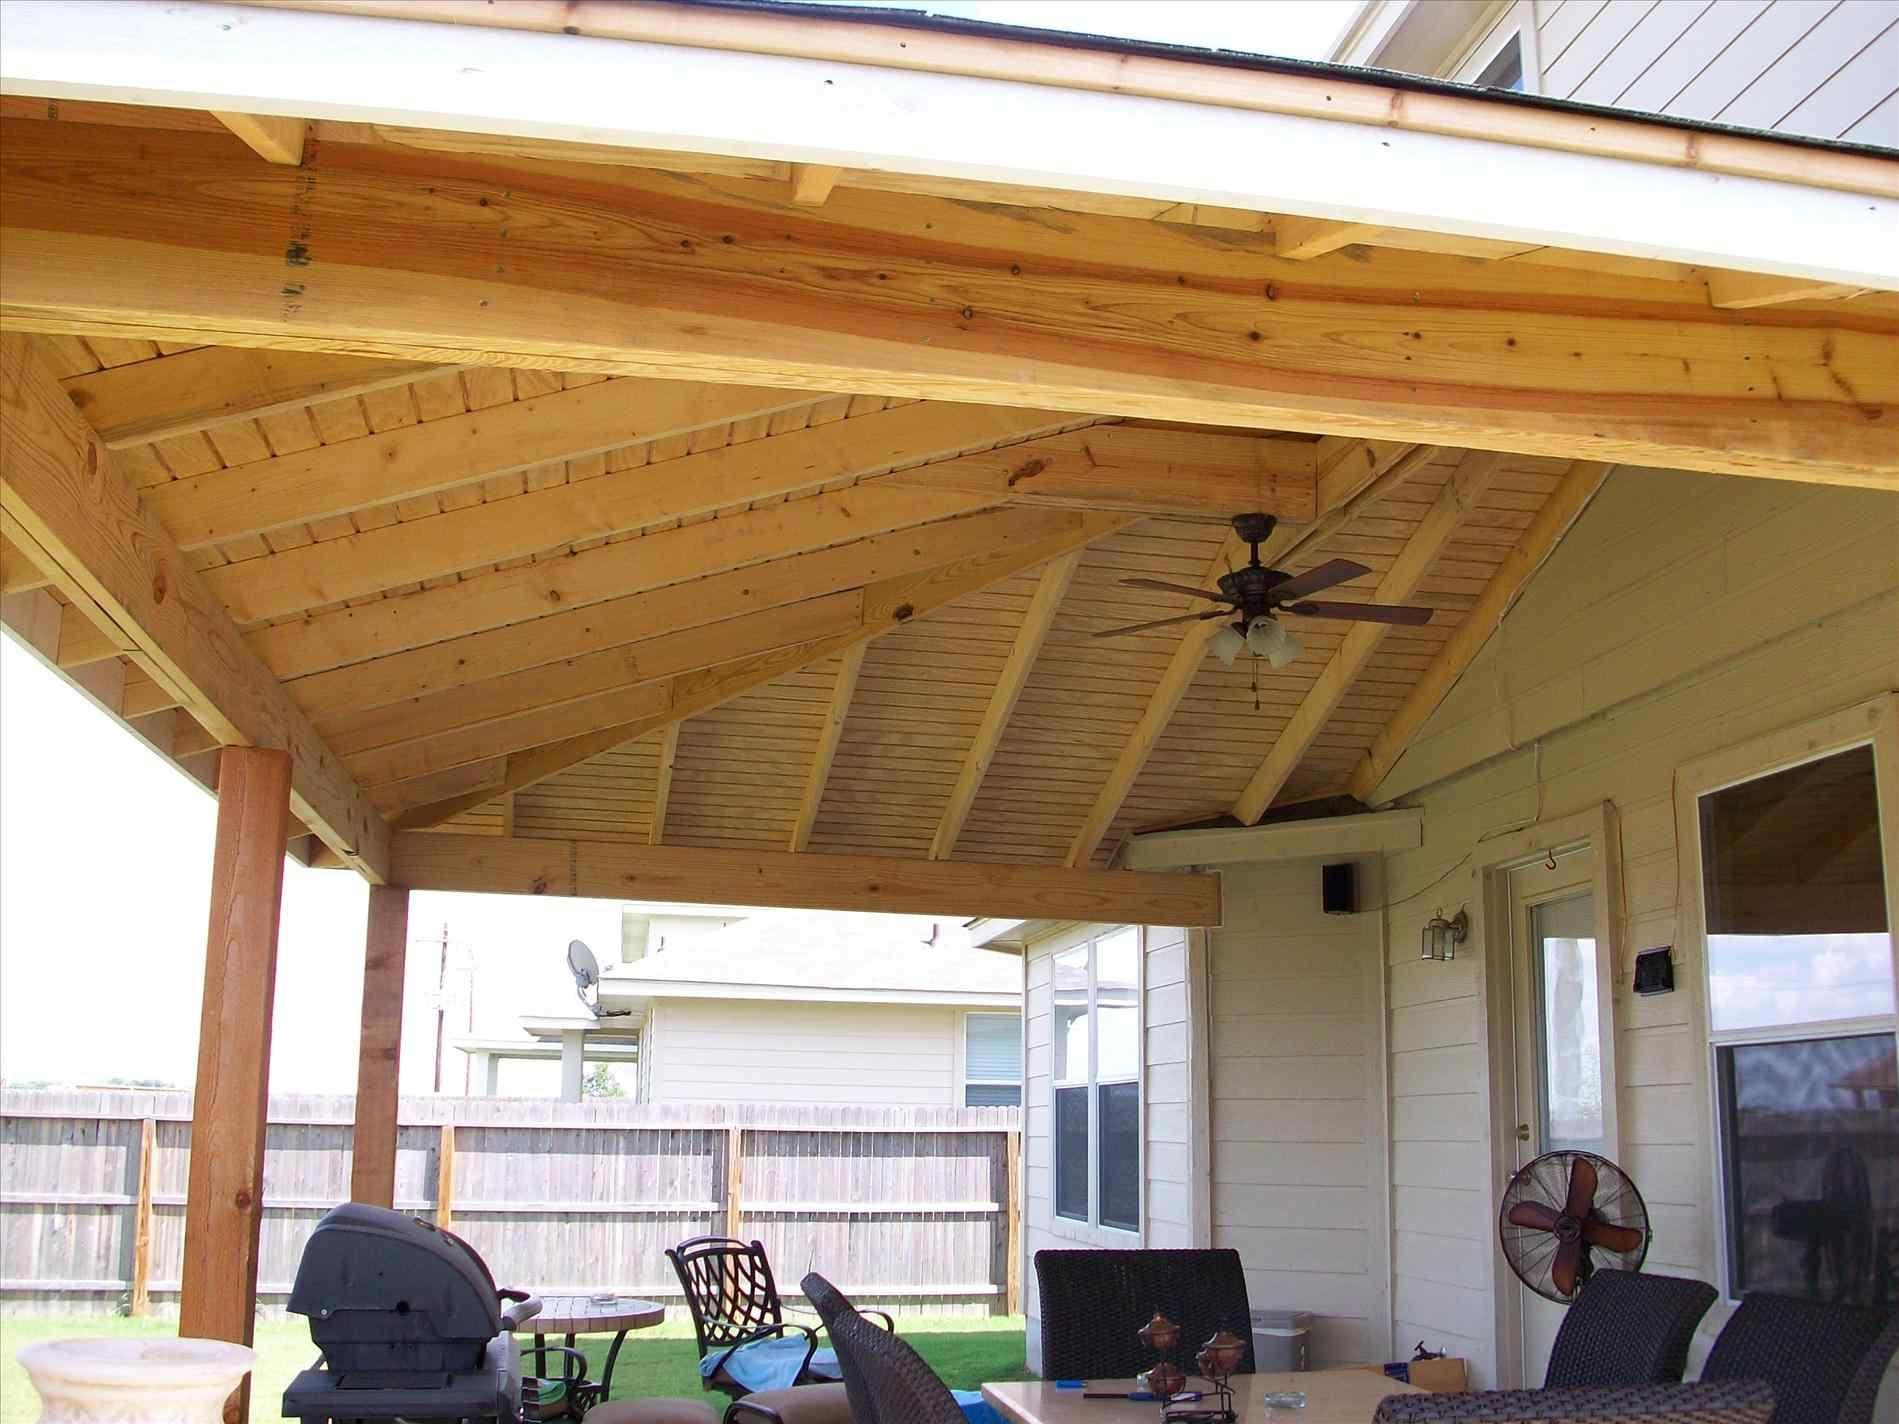 Modern Hip Roof Designs Home Roof Ideas Pergola Hip Roof Design Patio Design